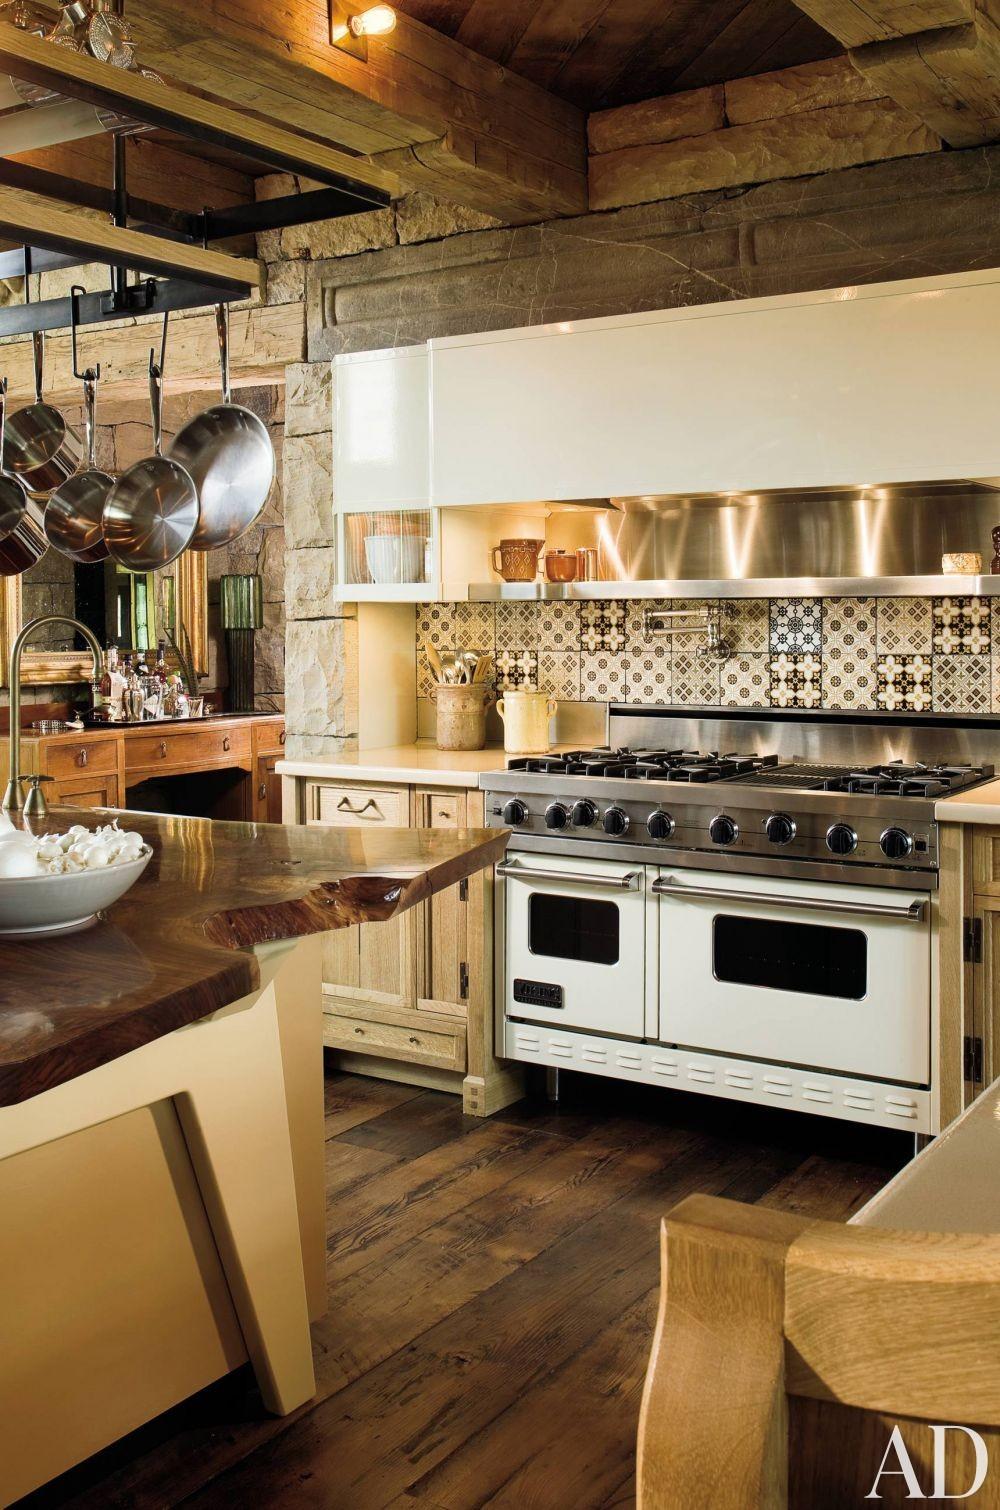 Rustic Kitchen by Studio Sofield in Colorado